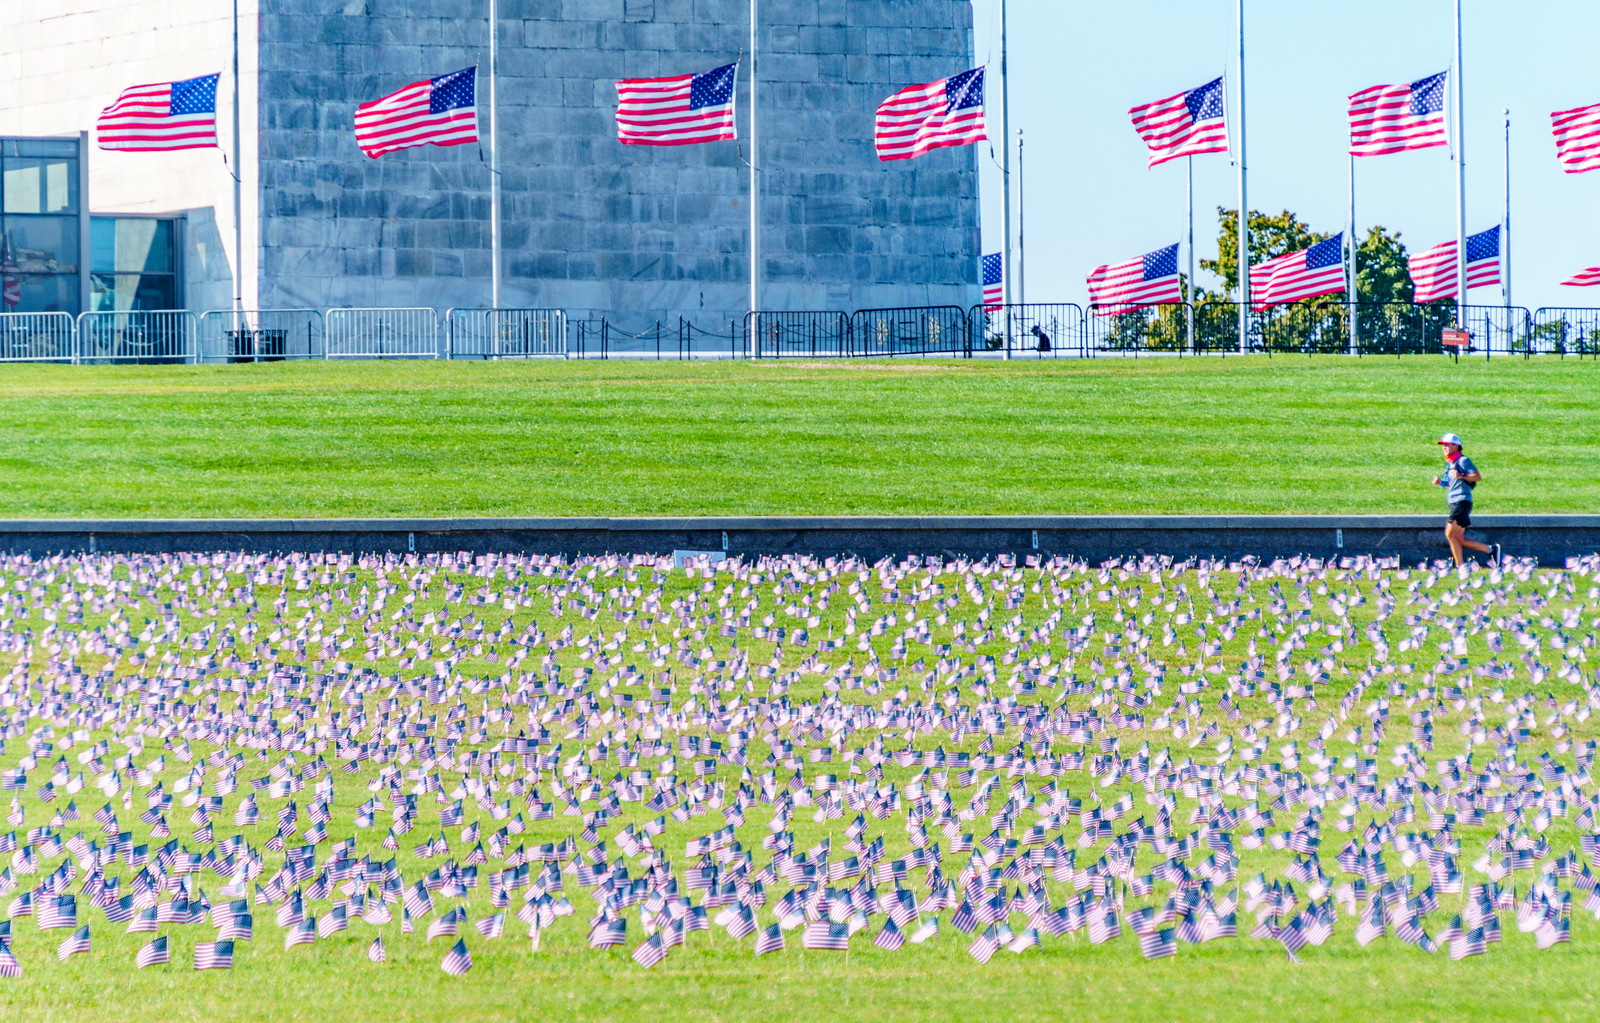 2020.09.23 Covid Memorial Project, Washington, DC USA